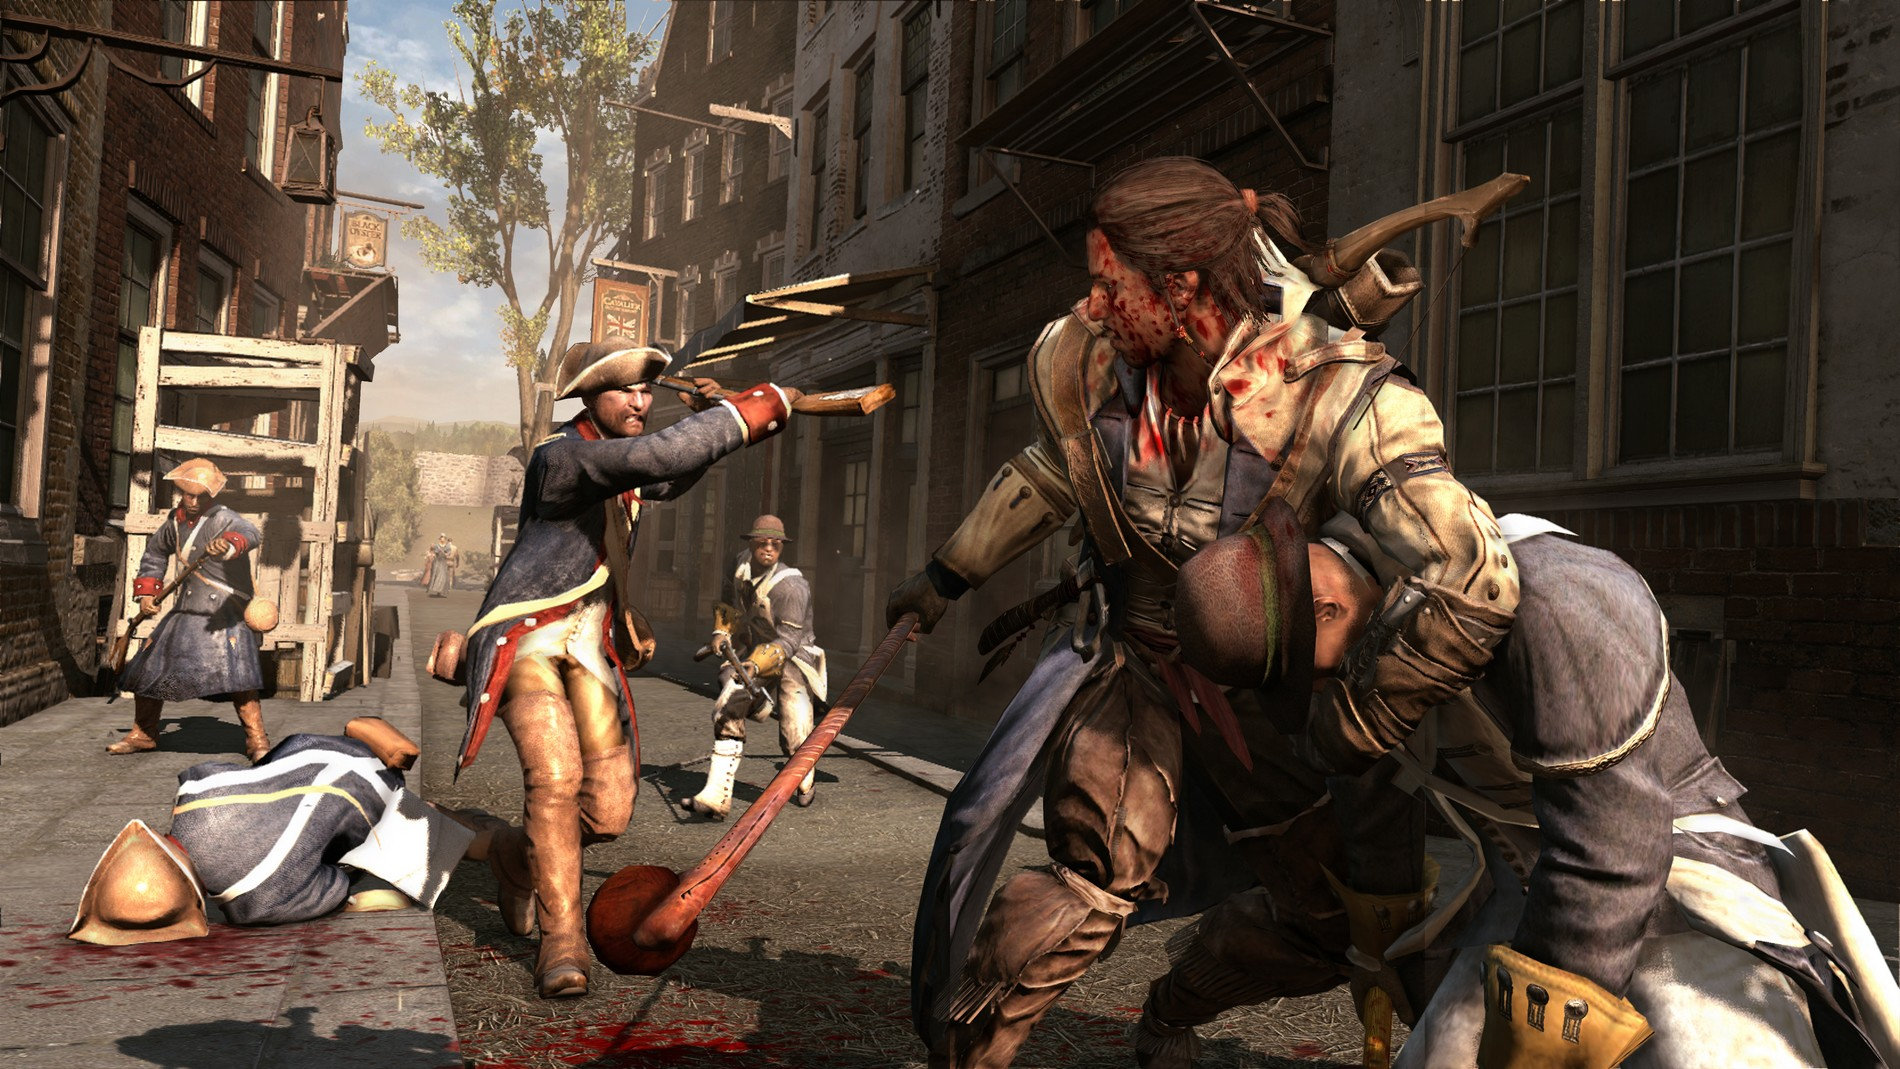 Assassins creed 3 nude glitch xxx movies